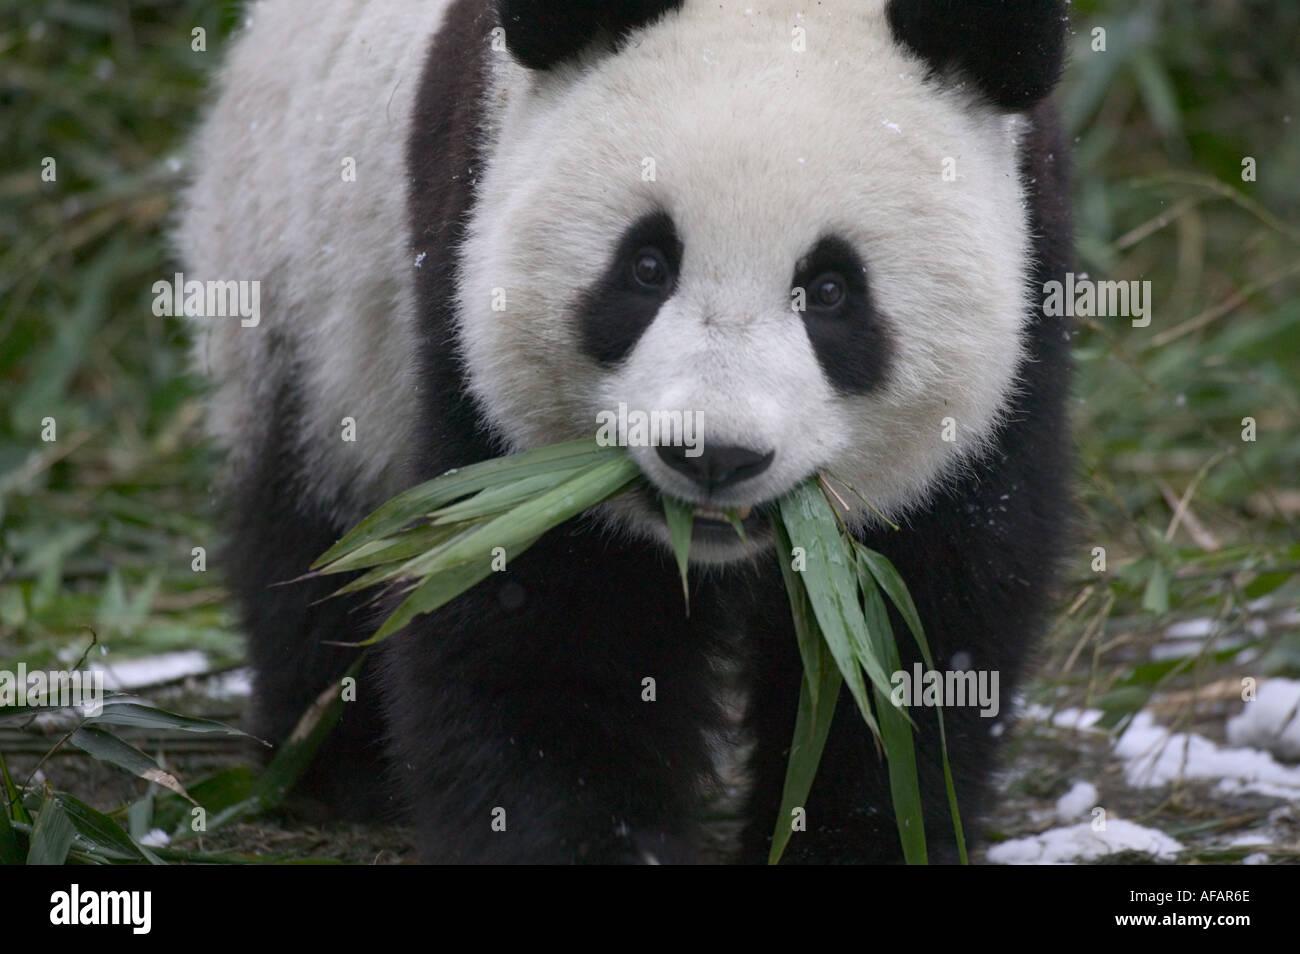 Giant Panda Bambus Auf Schnee Wolong Panda Reservat Provinz Sichuan